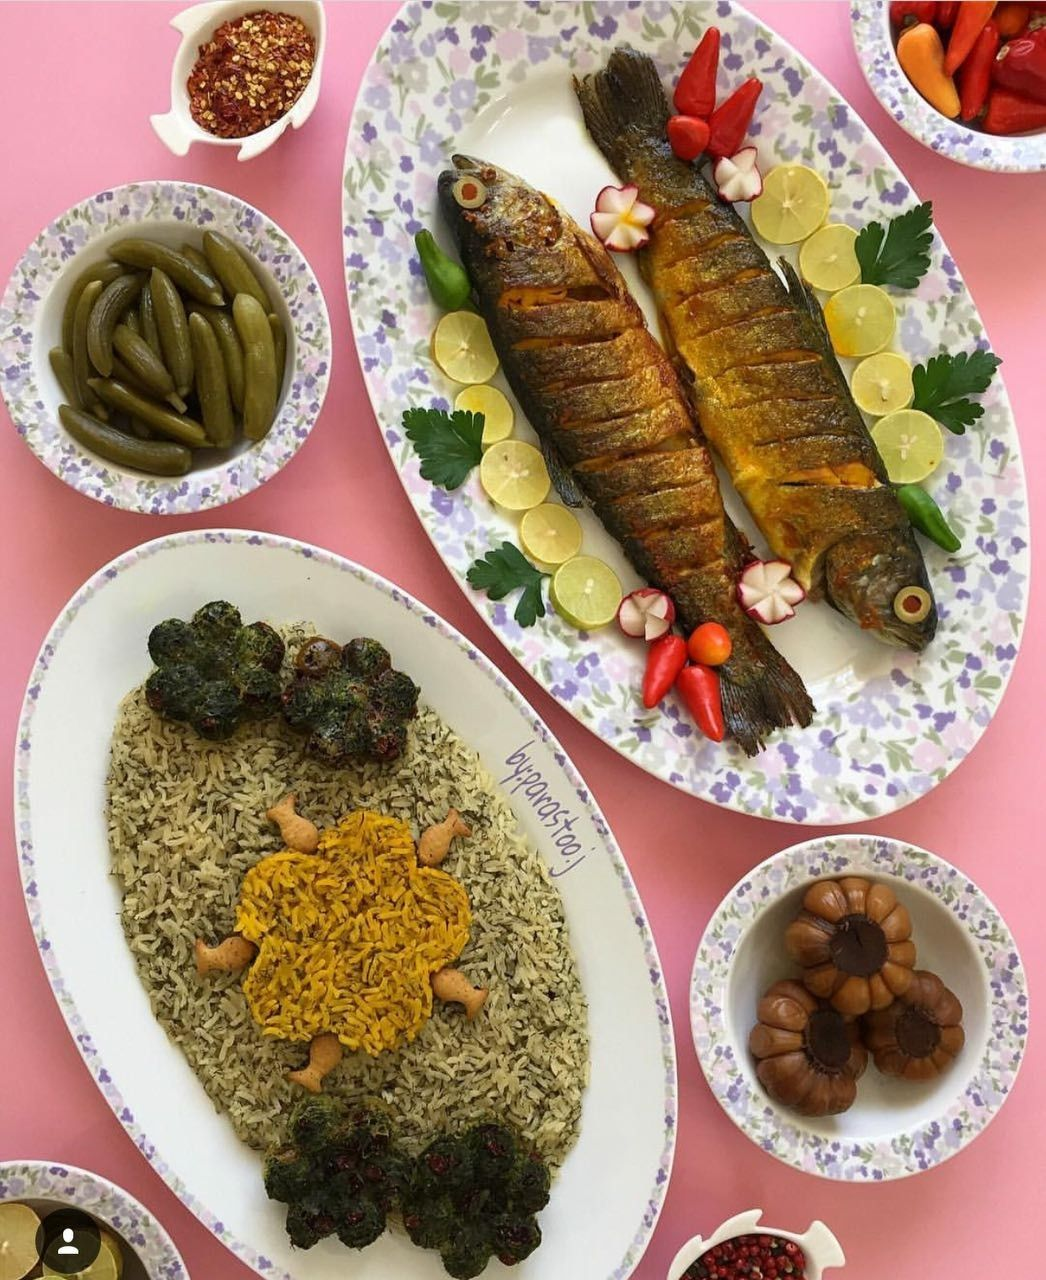 تزیین پلو ماهی | Food | Pinterest | Iranian food, Rice and ...